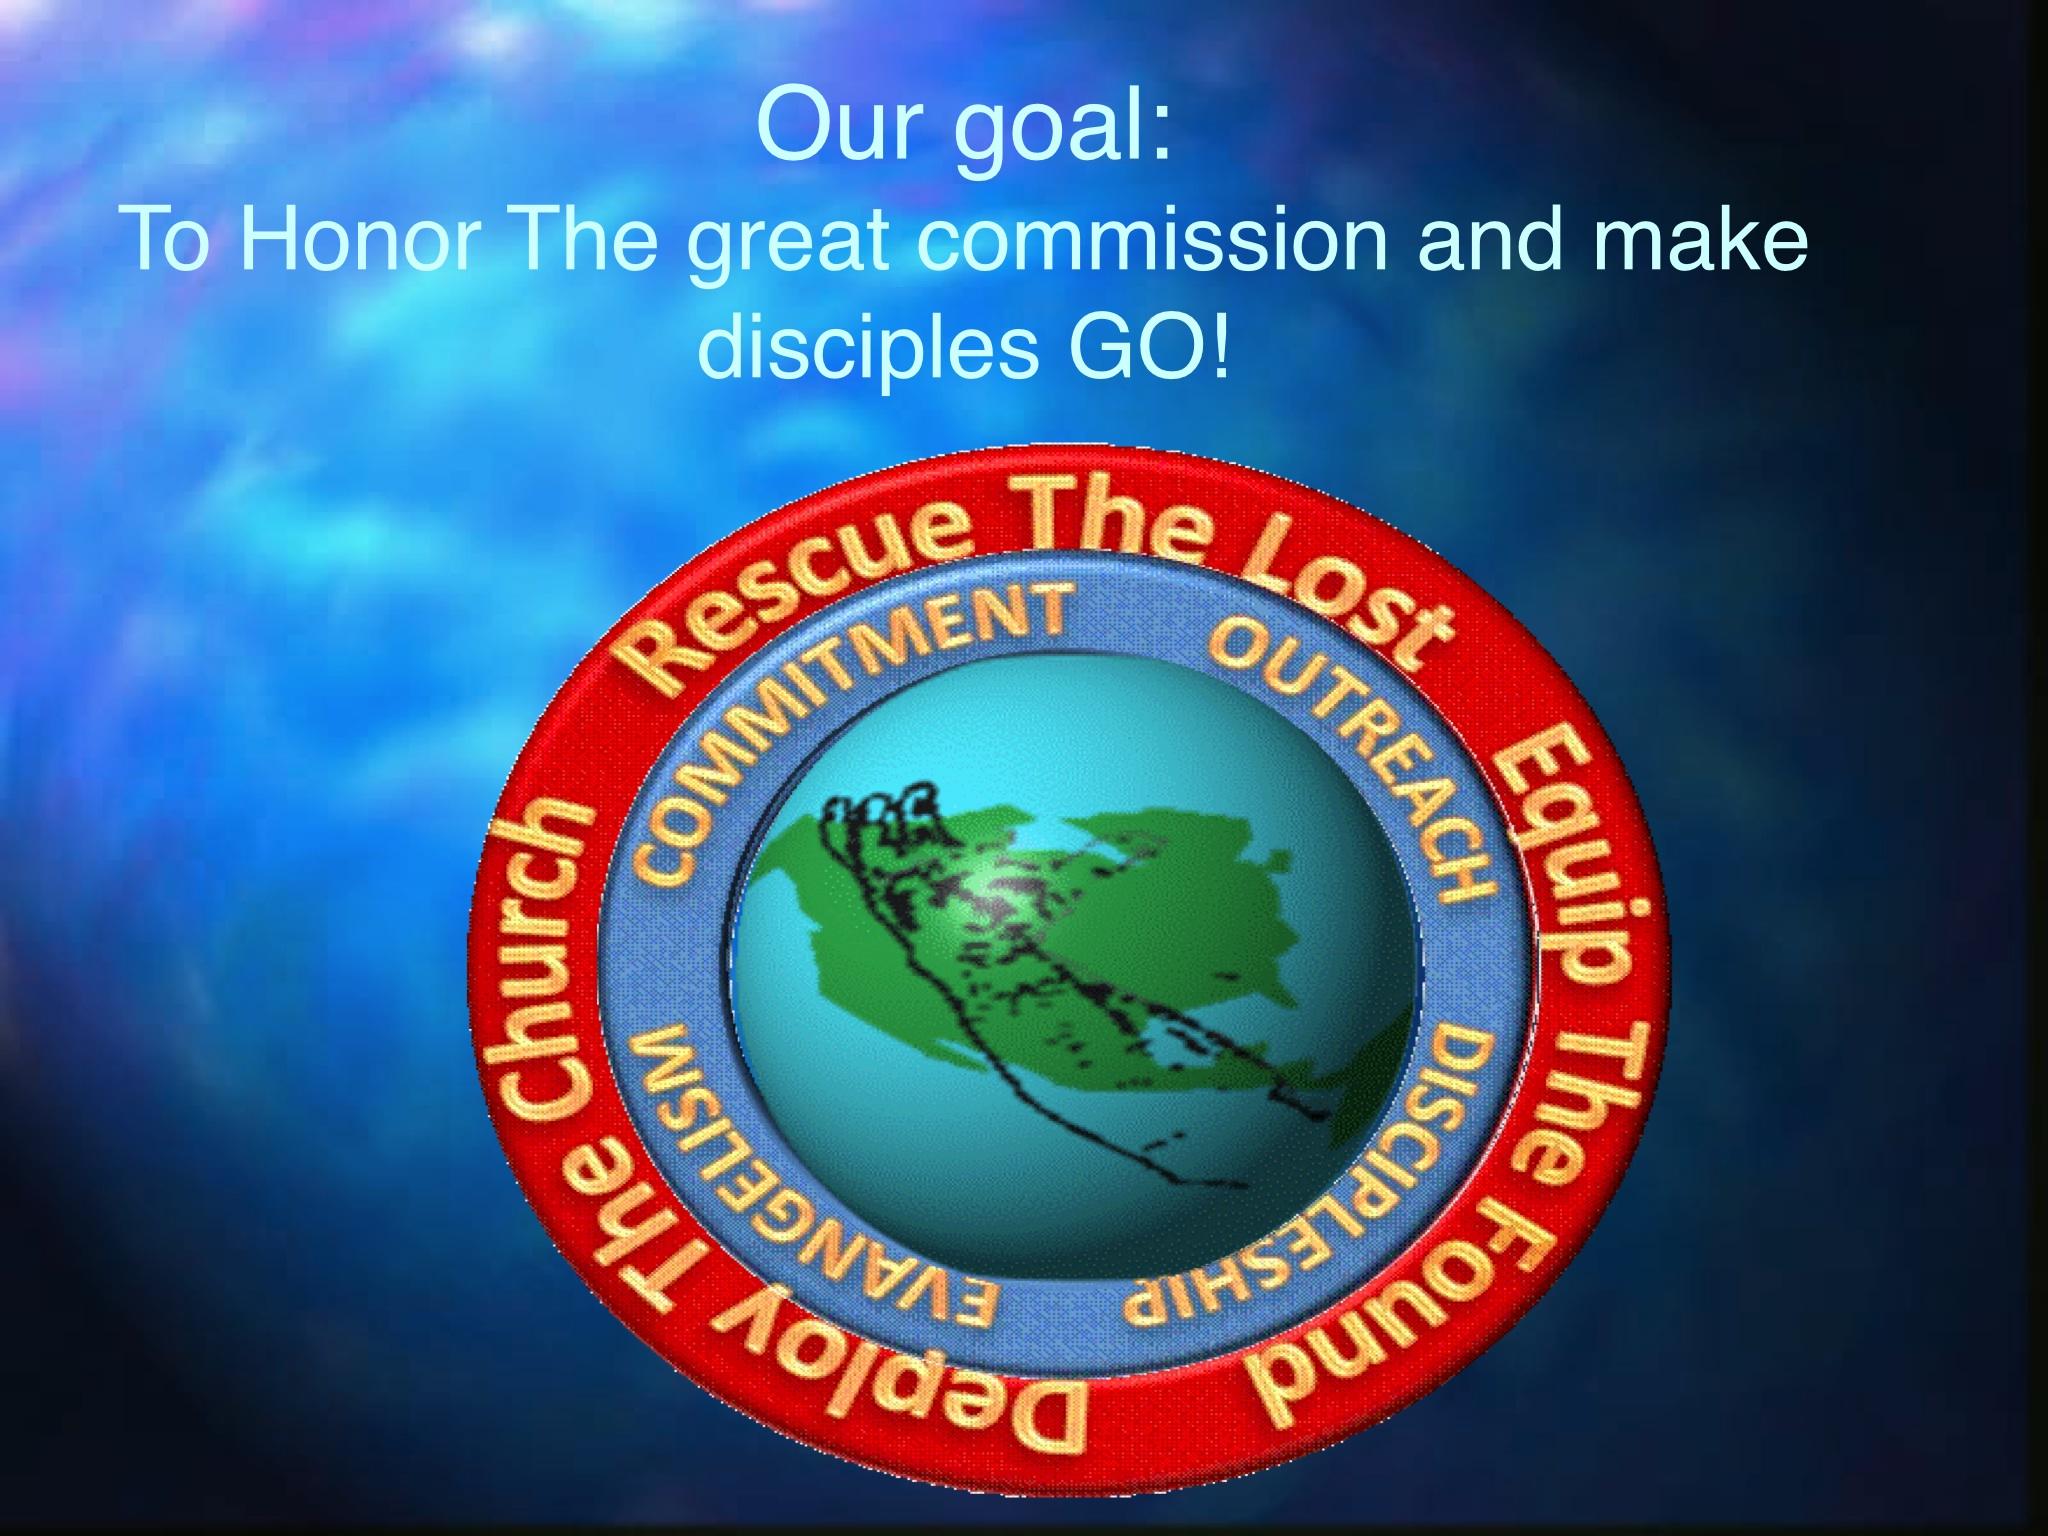 City limits Assembly of God of Allentown, PA